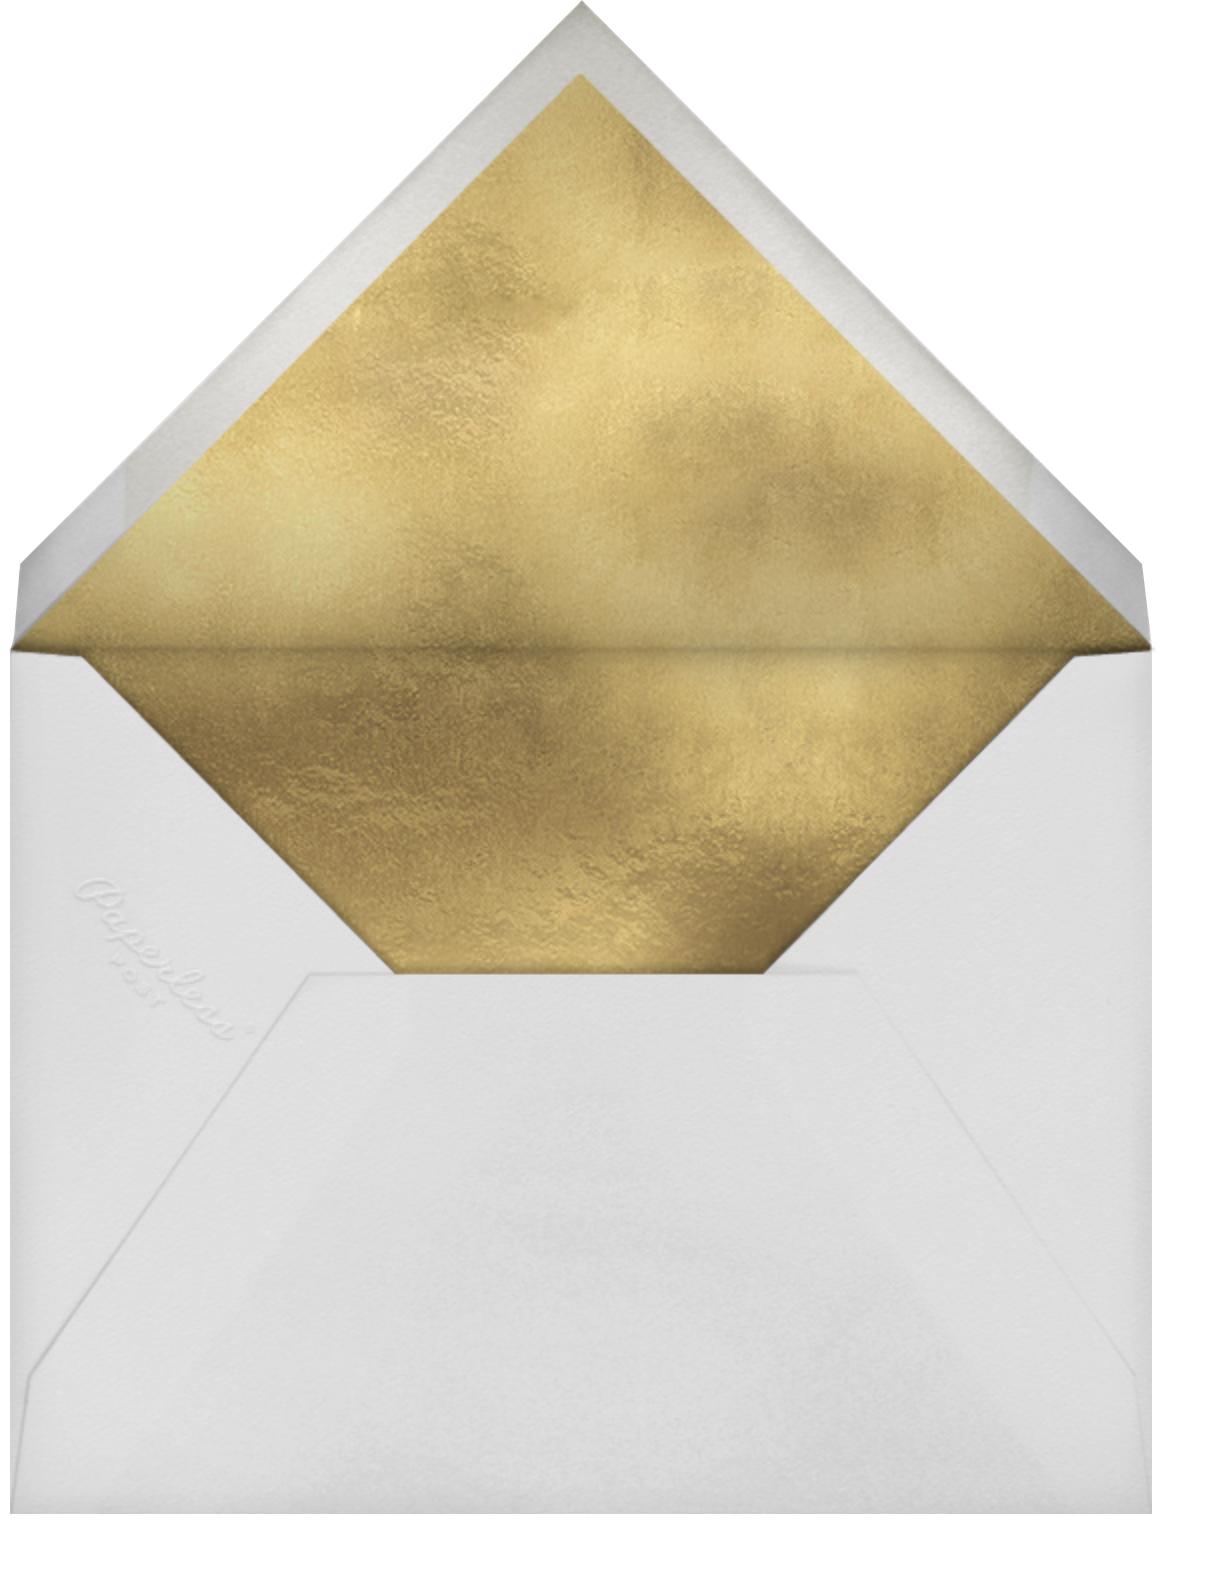 Leopard - Longhorn - kate spade new york - Adult birthday - envelope back